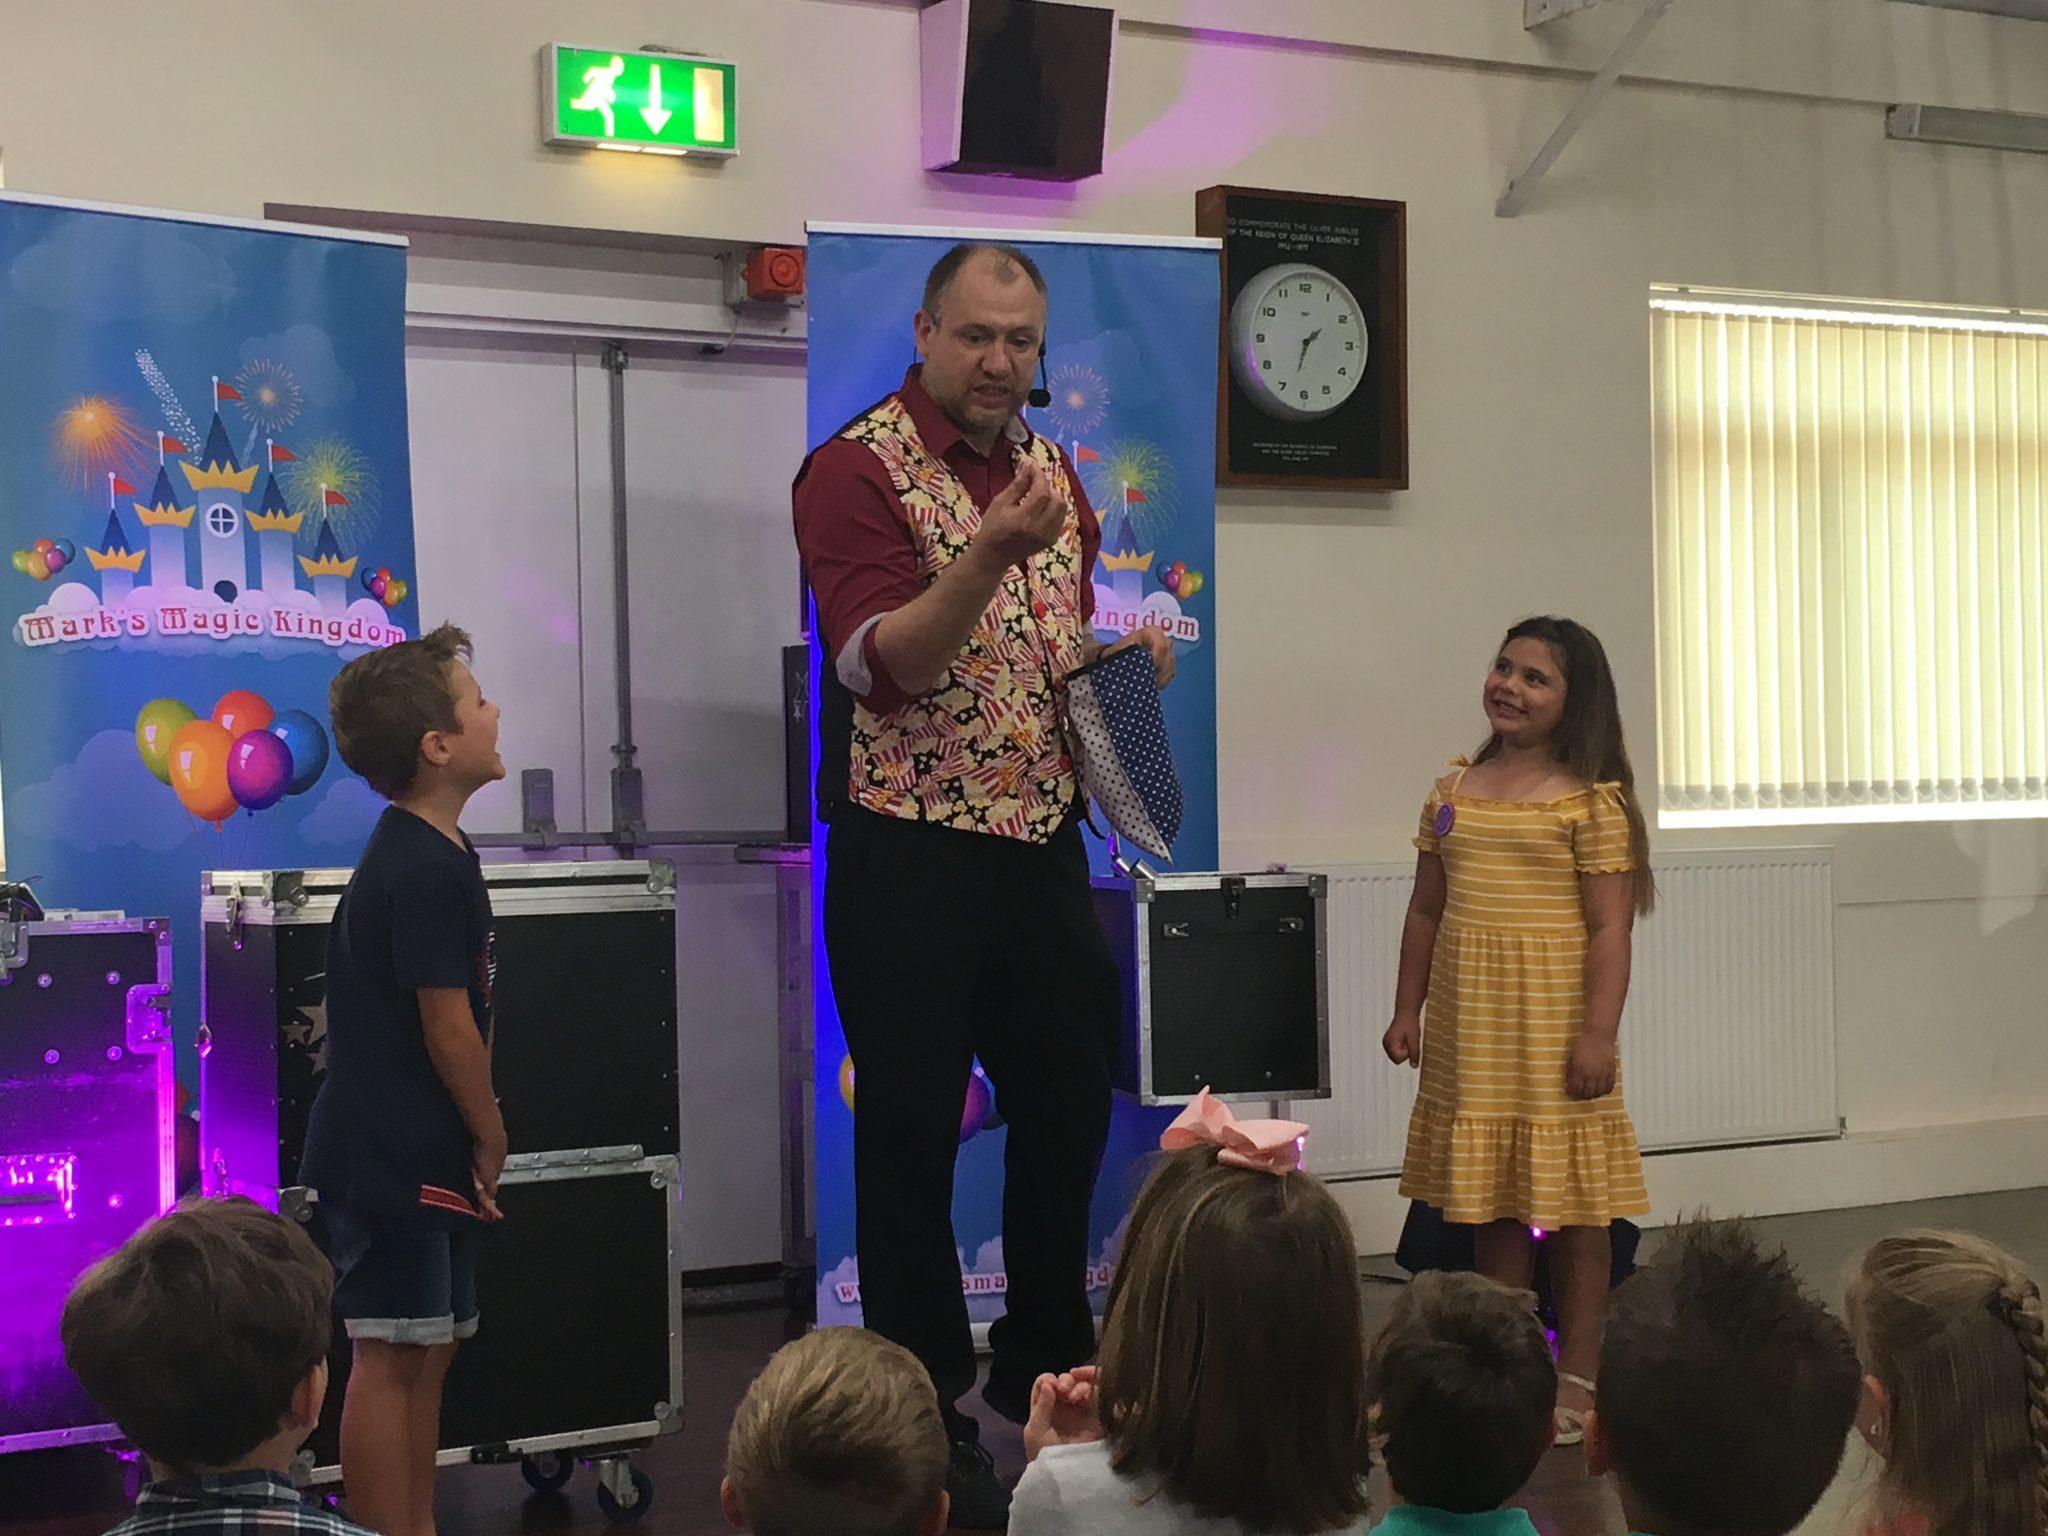 Children's entertainer Bradford